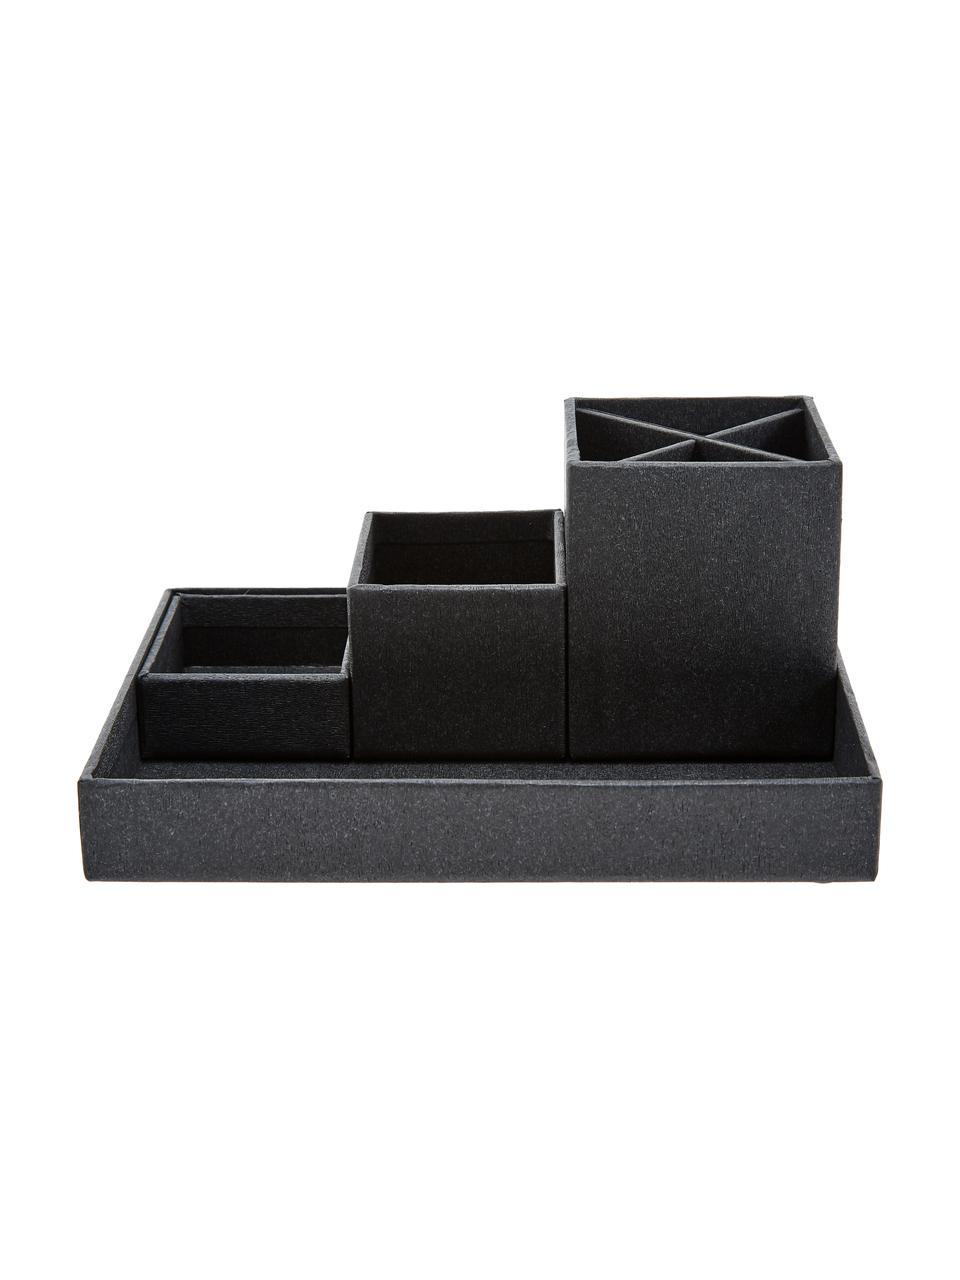 Büro-Organizer-Set Lena, 4-tlg., Fester Karton, mit Holzdekor bedruckt, Schwarz, Sondergrößen